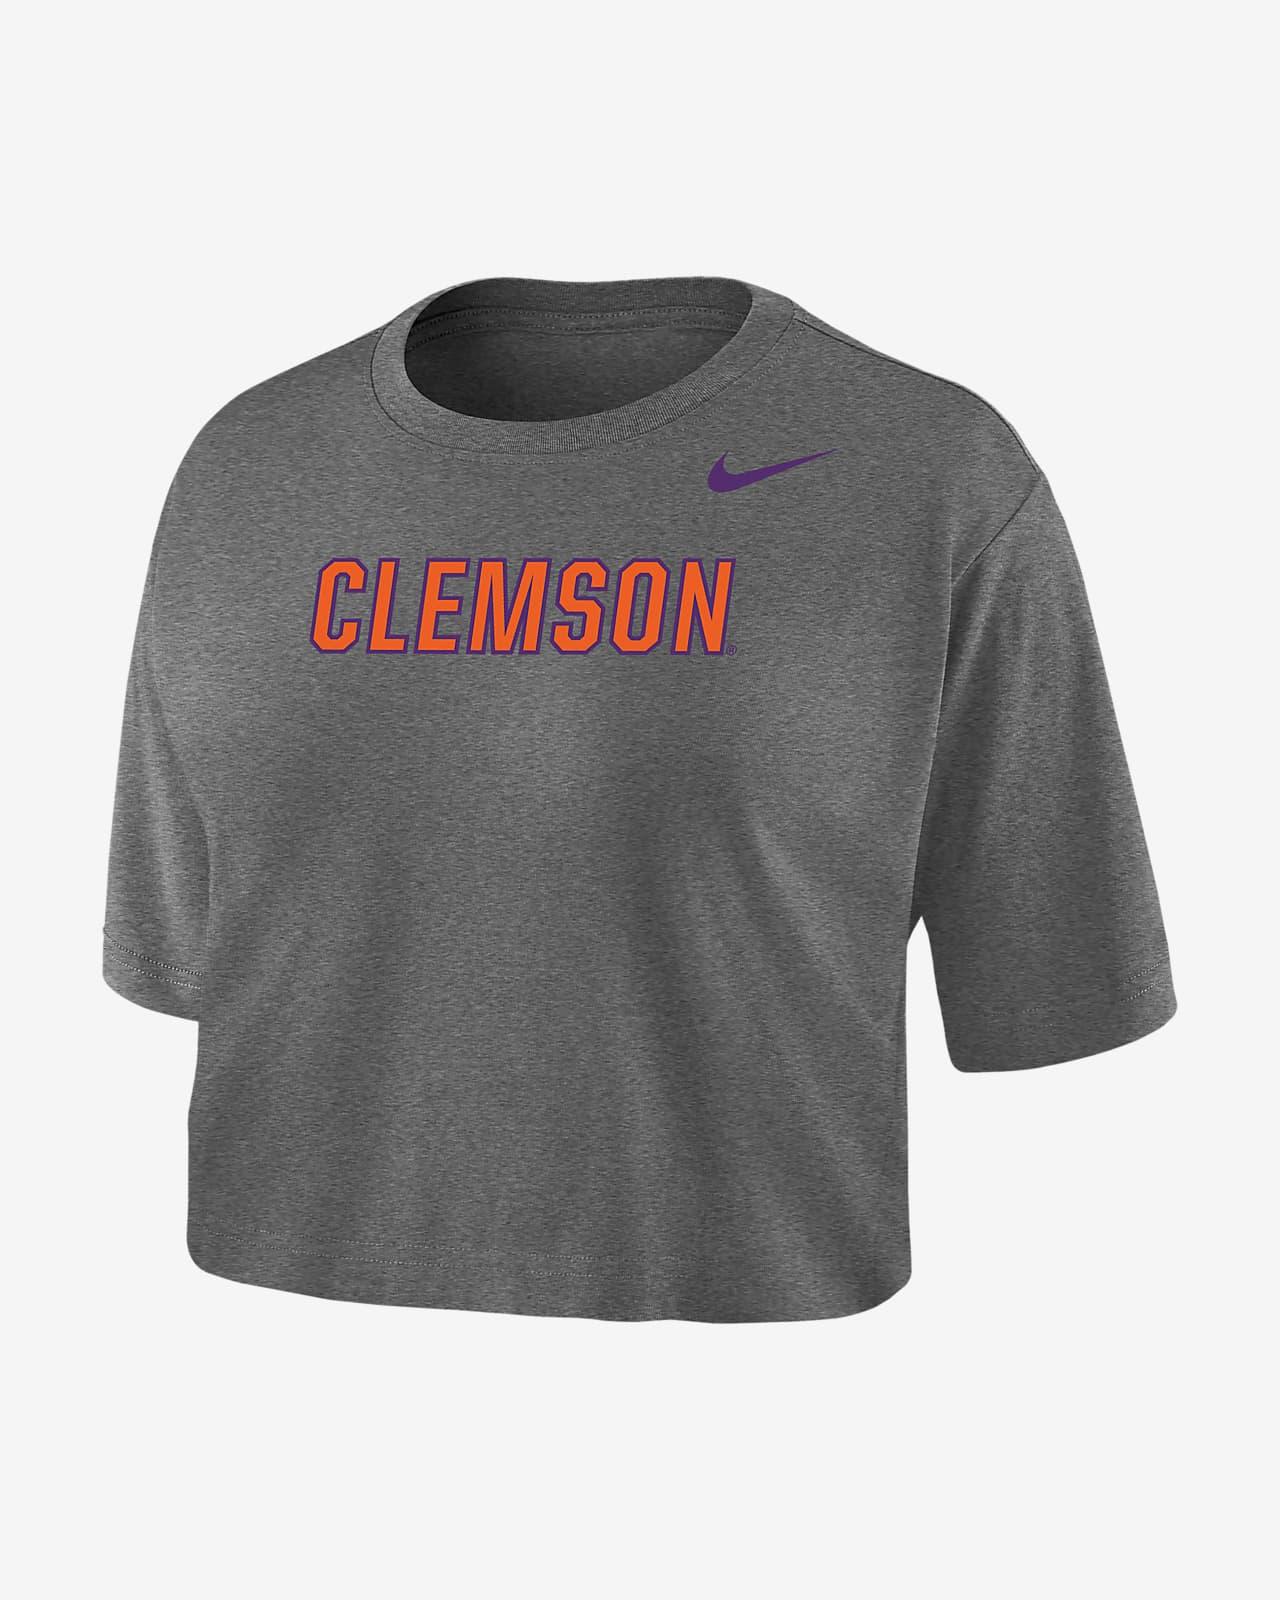 Nike College Dri-FIT (Clemson) Women's Crop T-Shirt